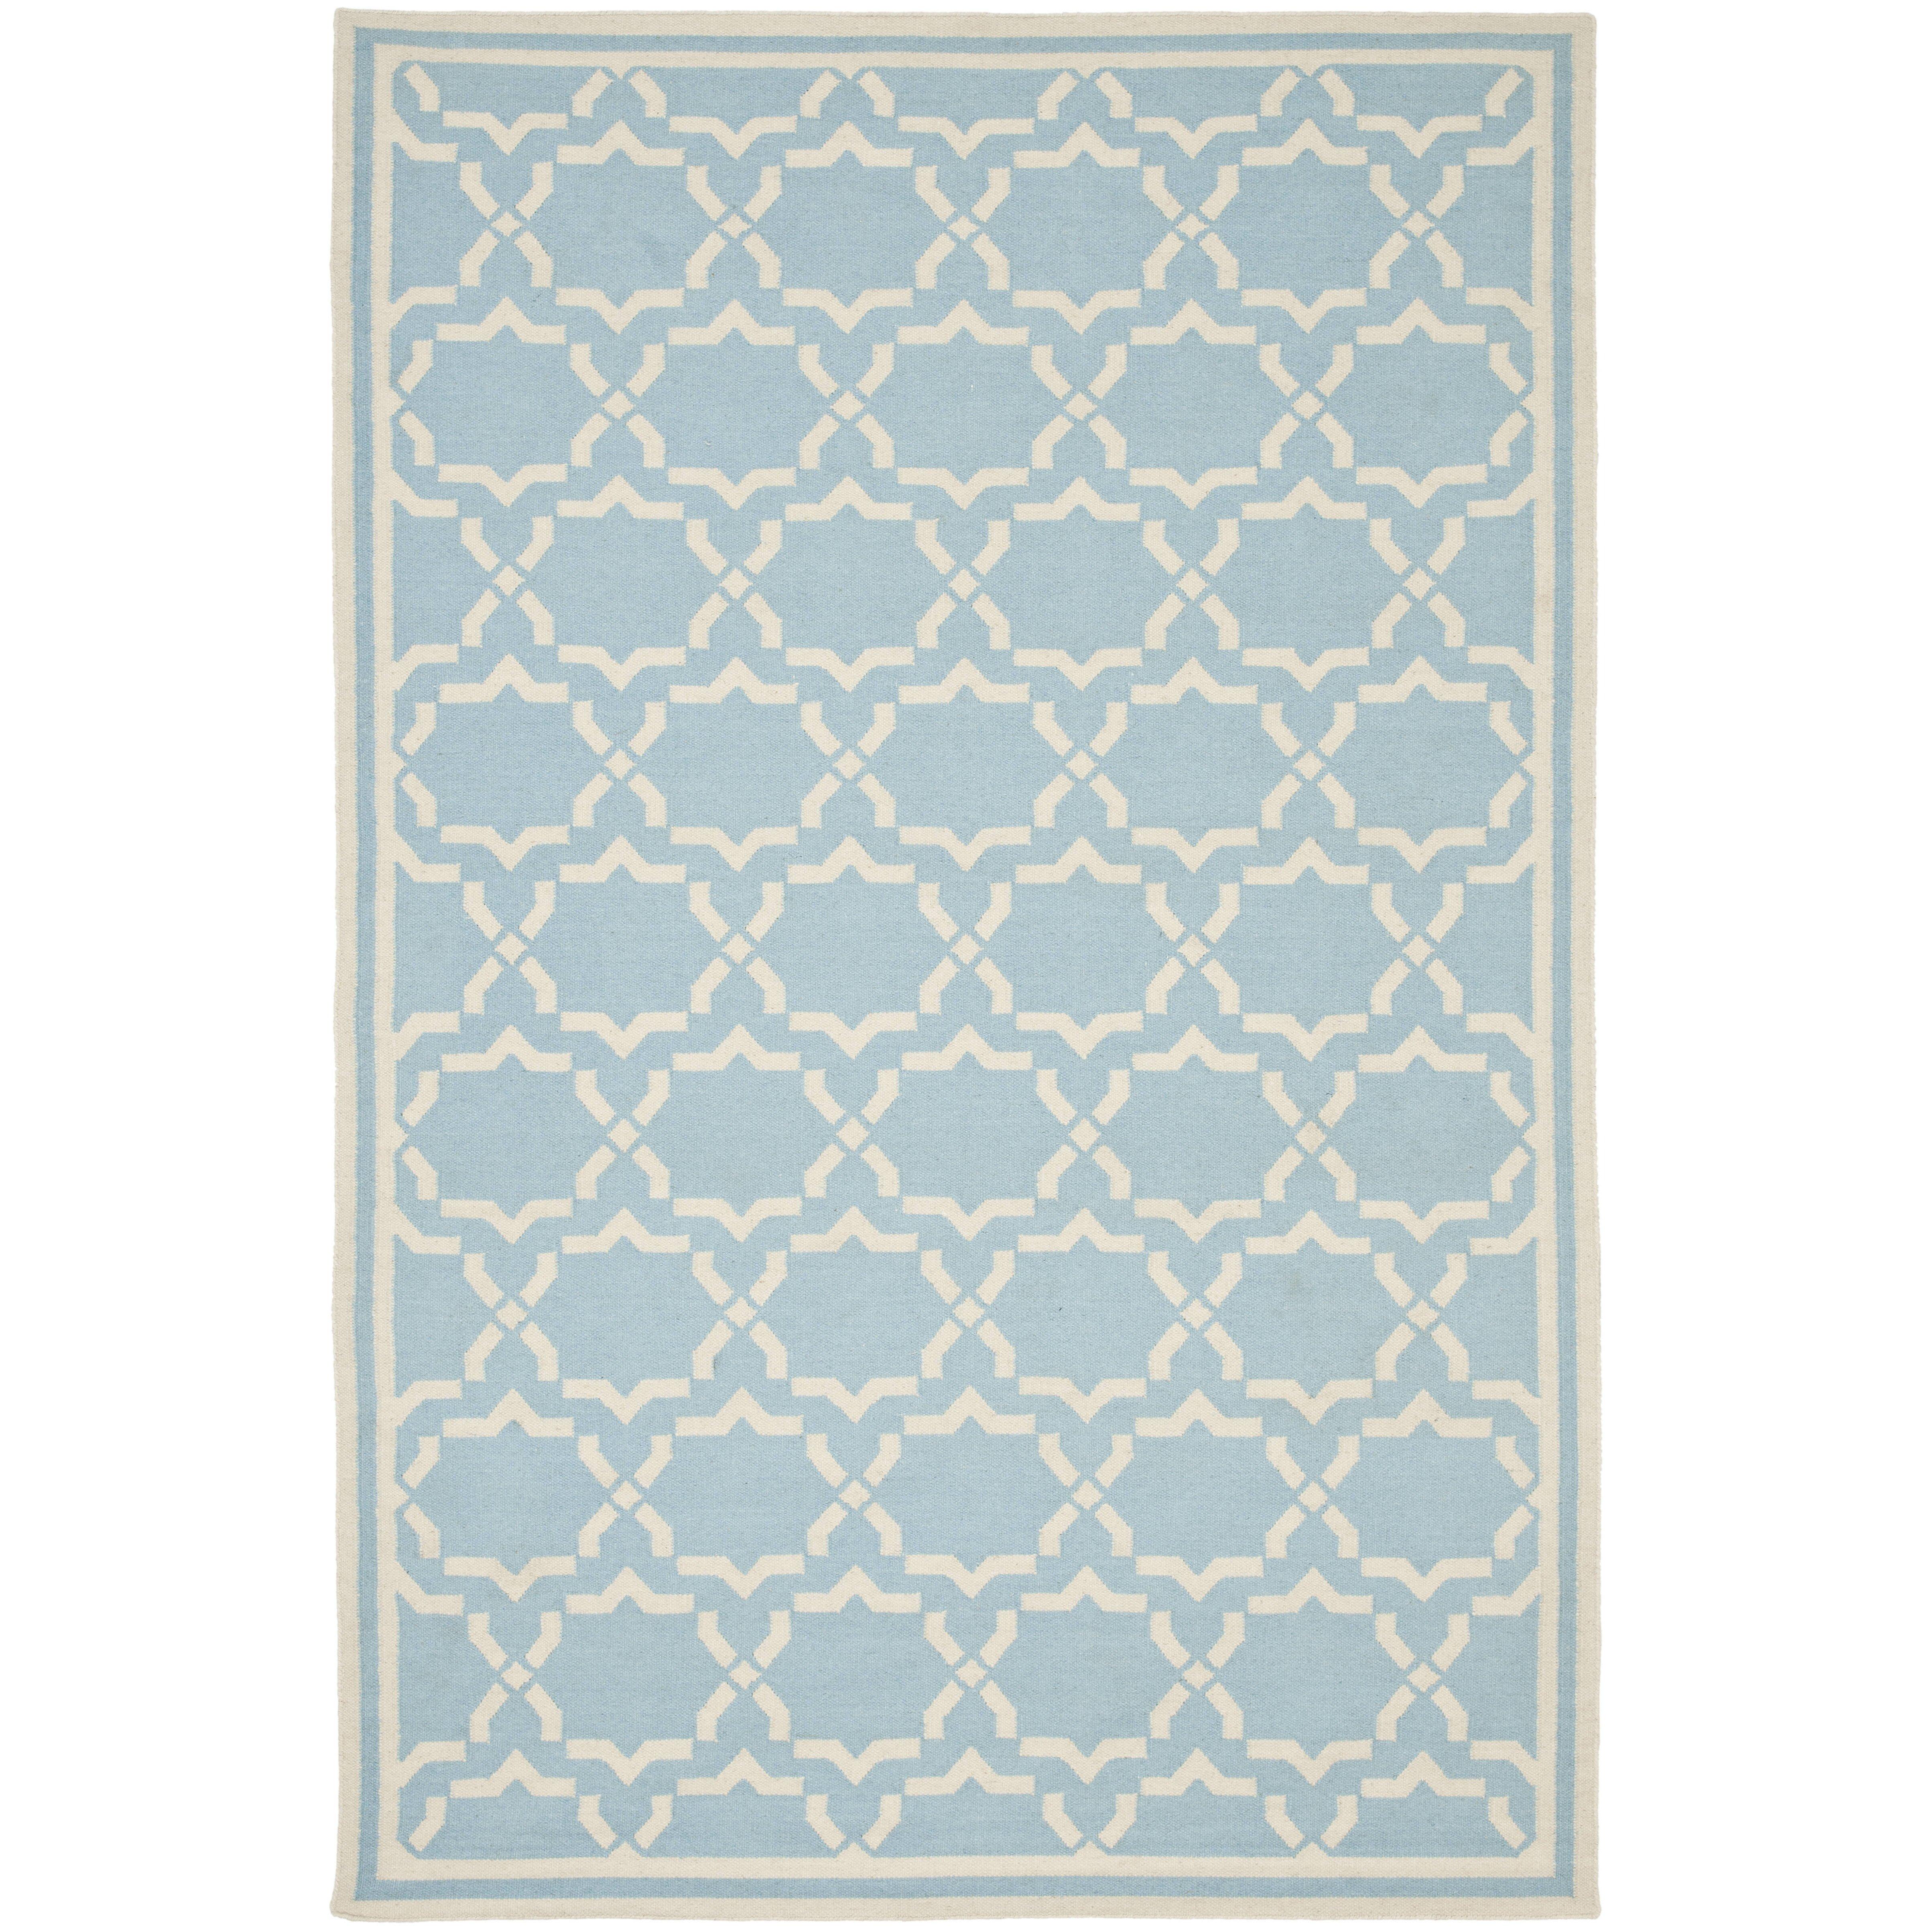 Safavieh Dhurries Light Blue Ivory Area Rug Amp Reviews